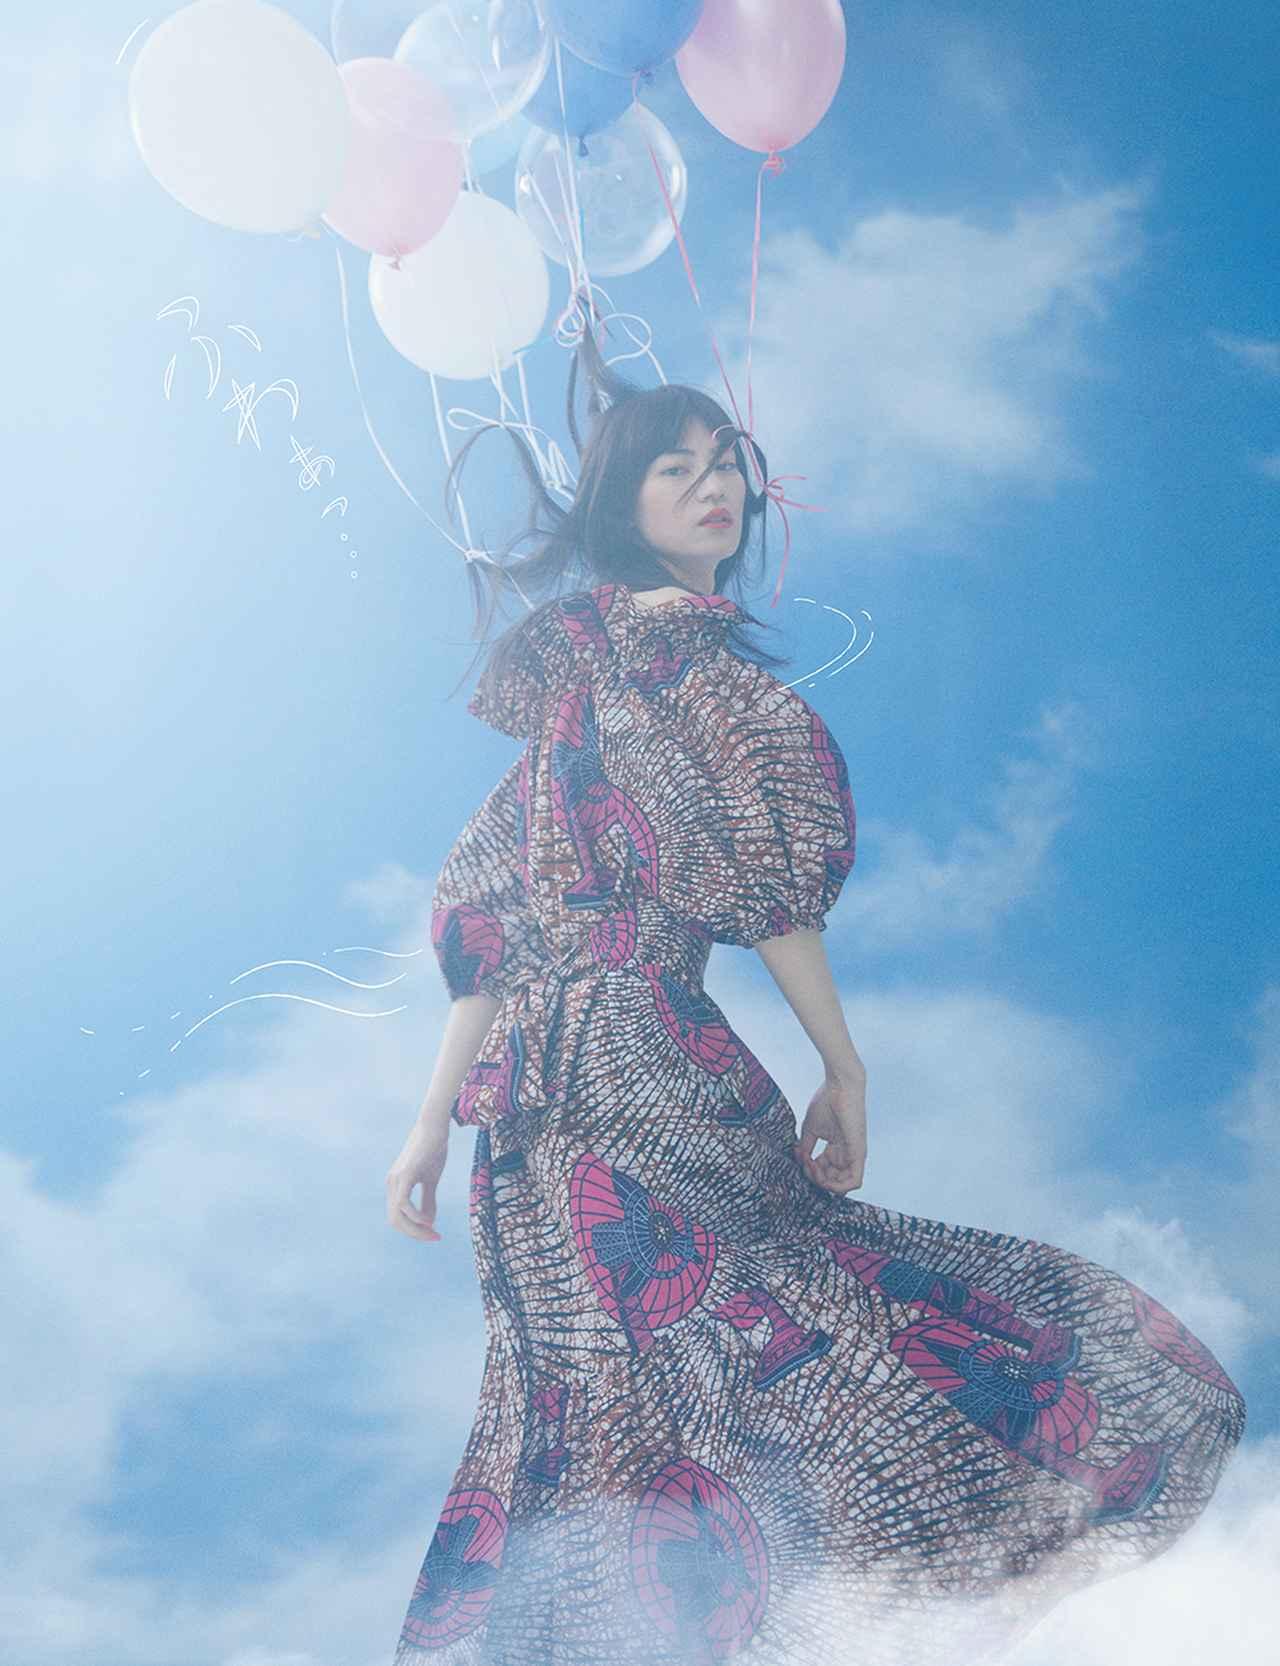 Images : 5番目の画像 - 「ファッションは愉快だ!」のアルバム - T JAPAN:The New York Times Style Magazine 公式サイト